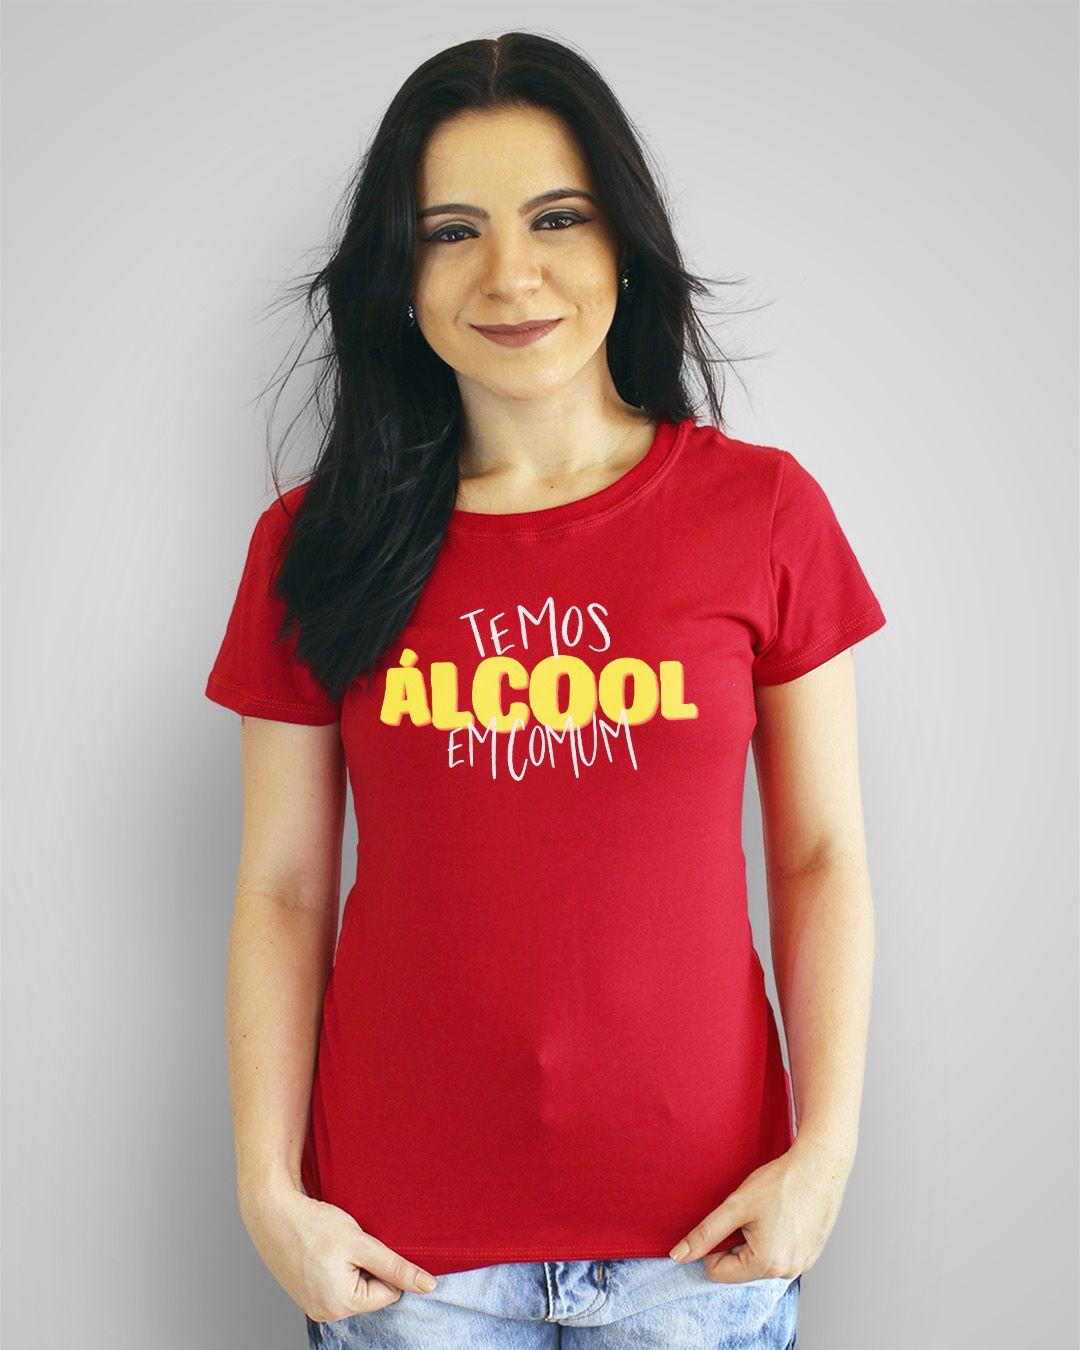 Camiseta Temos álcool em comum